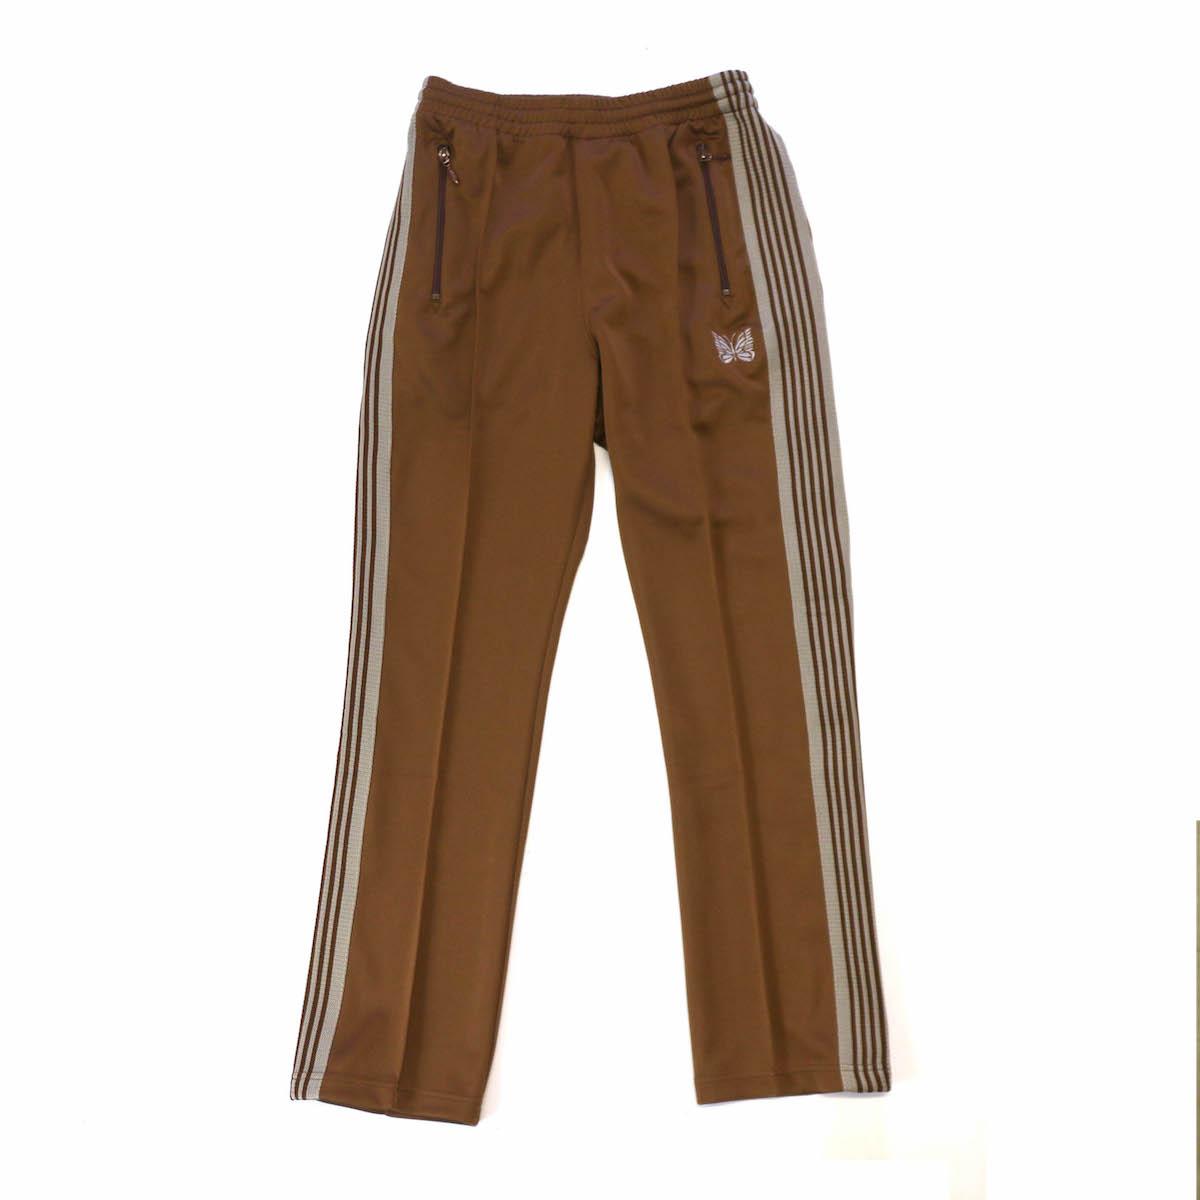 NEEDLES / NARROW TRACK PANTS -BROWN